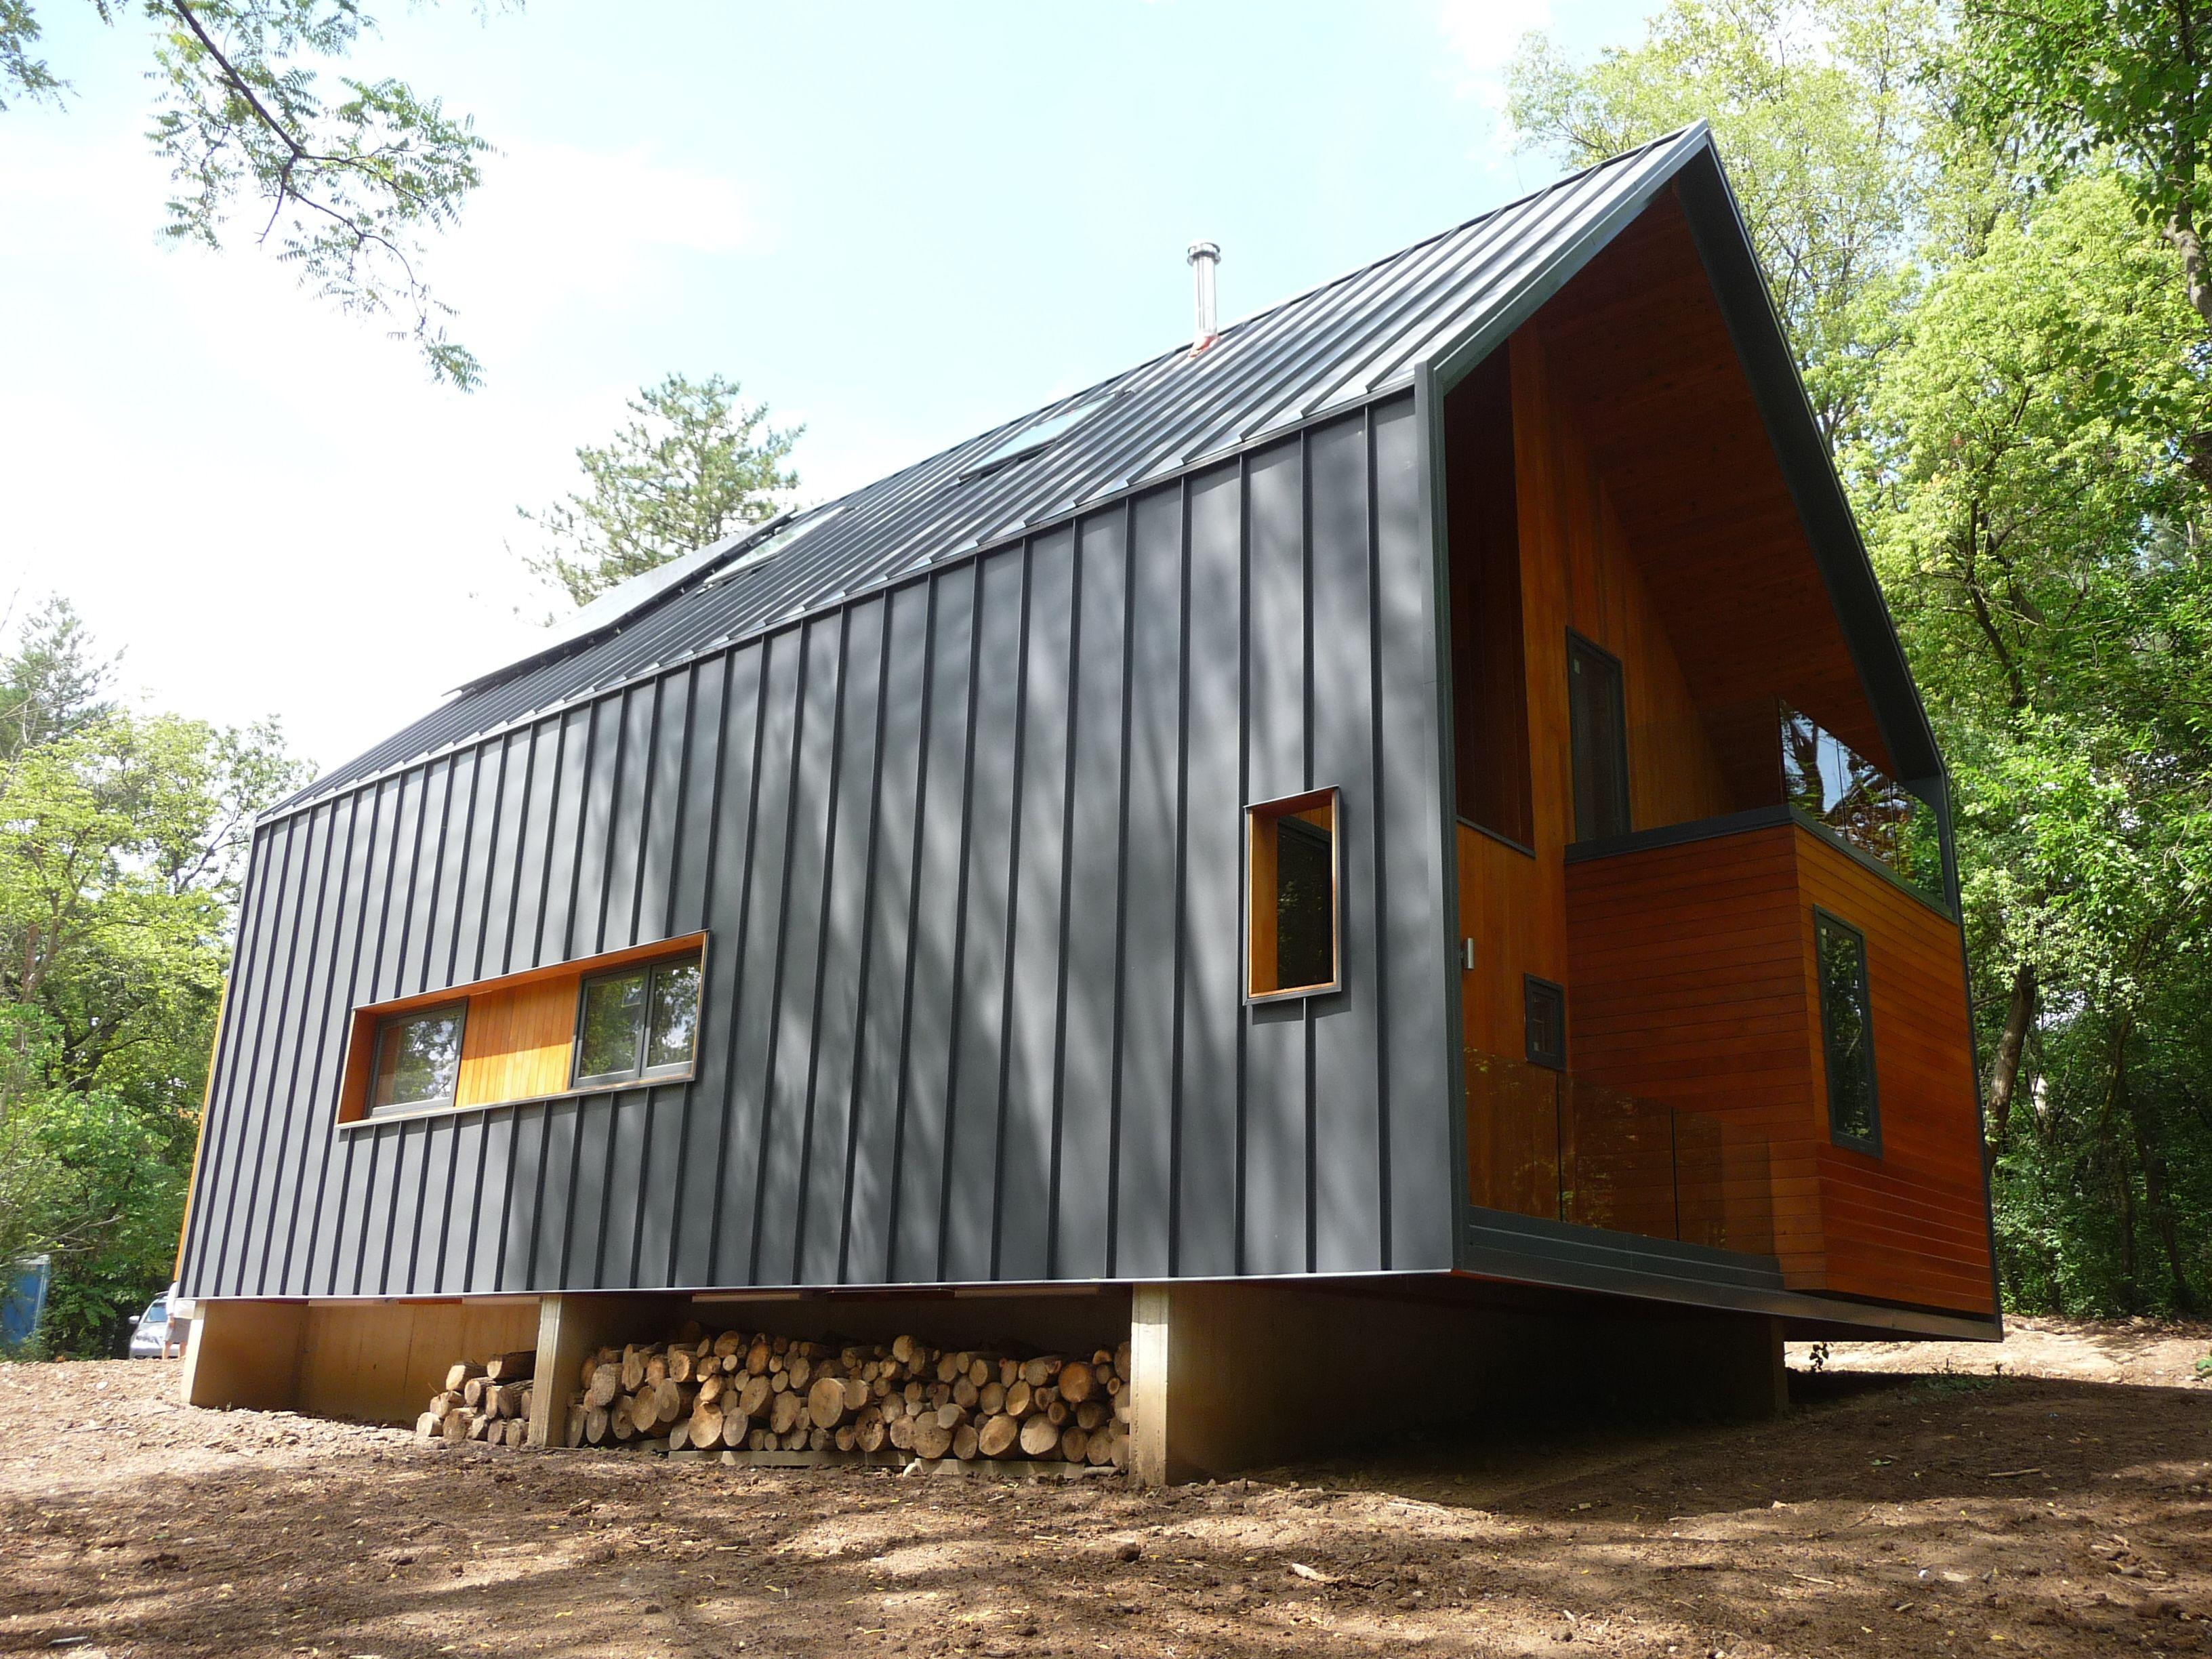 Finished exterior sans landscaping leed platinum house by bureau